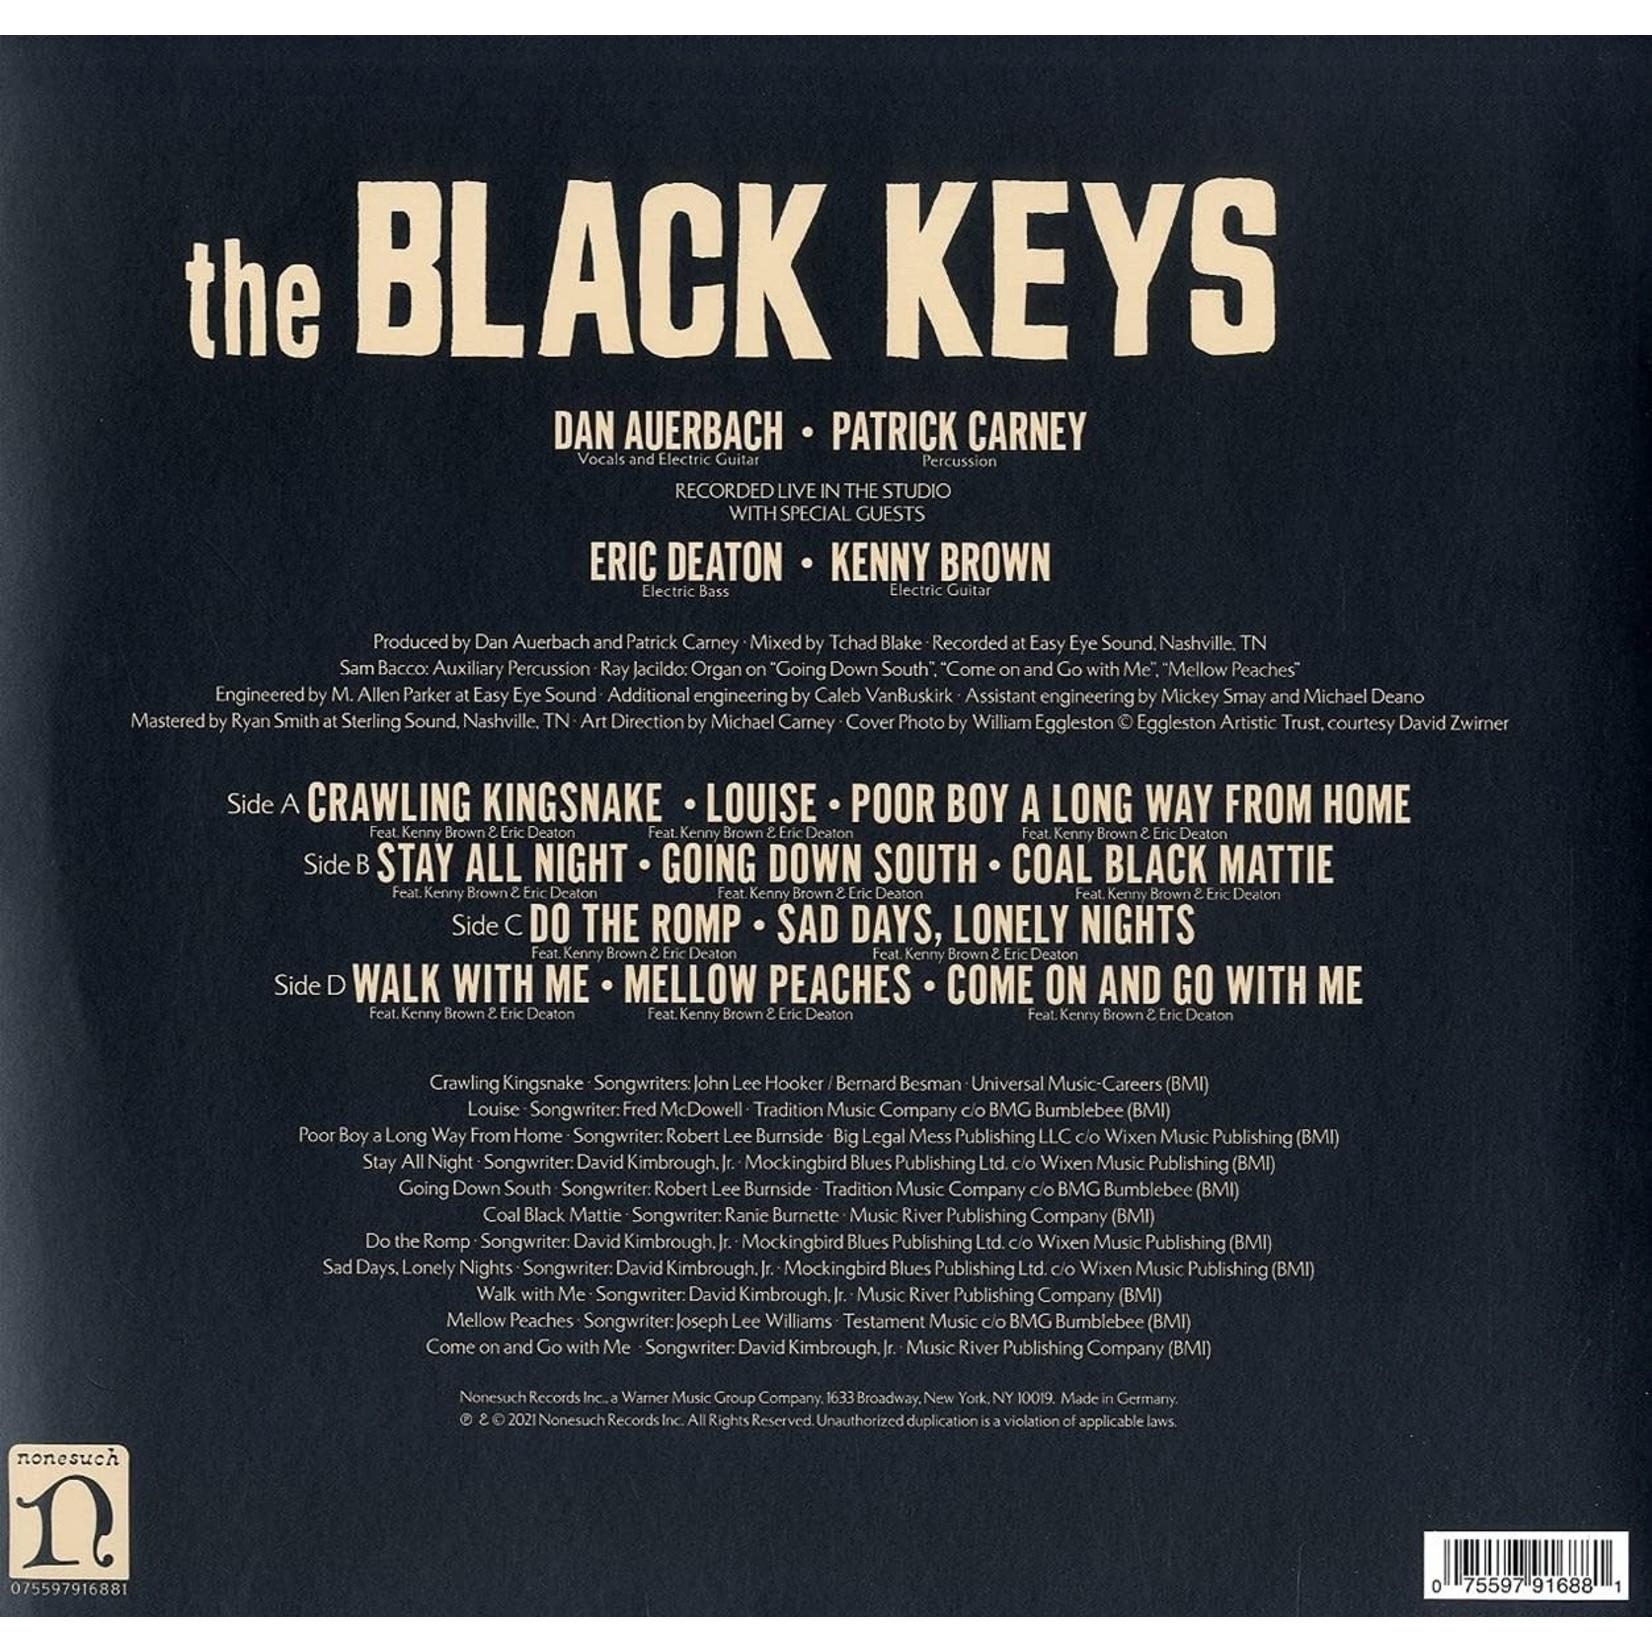 THE BLACK KEYS DELTA KREAM (2LP)